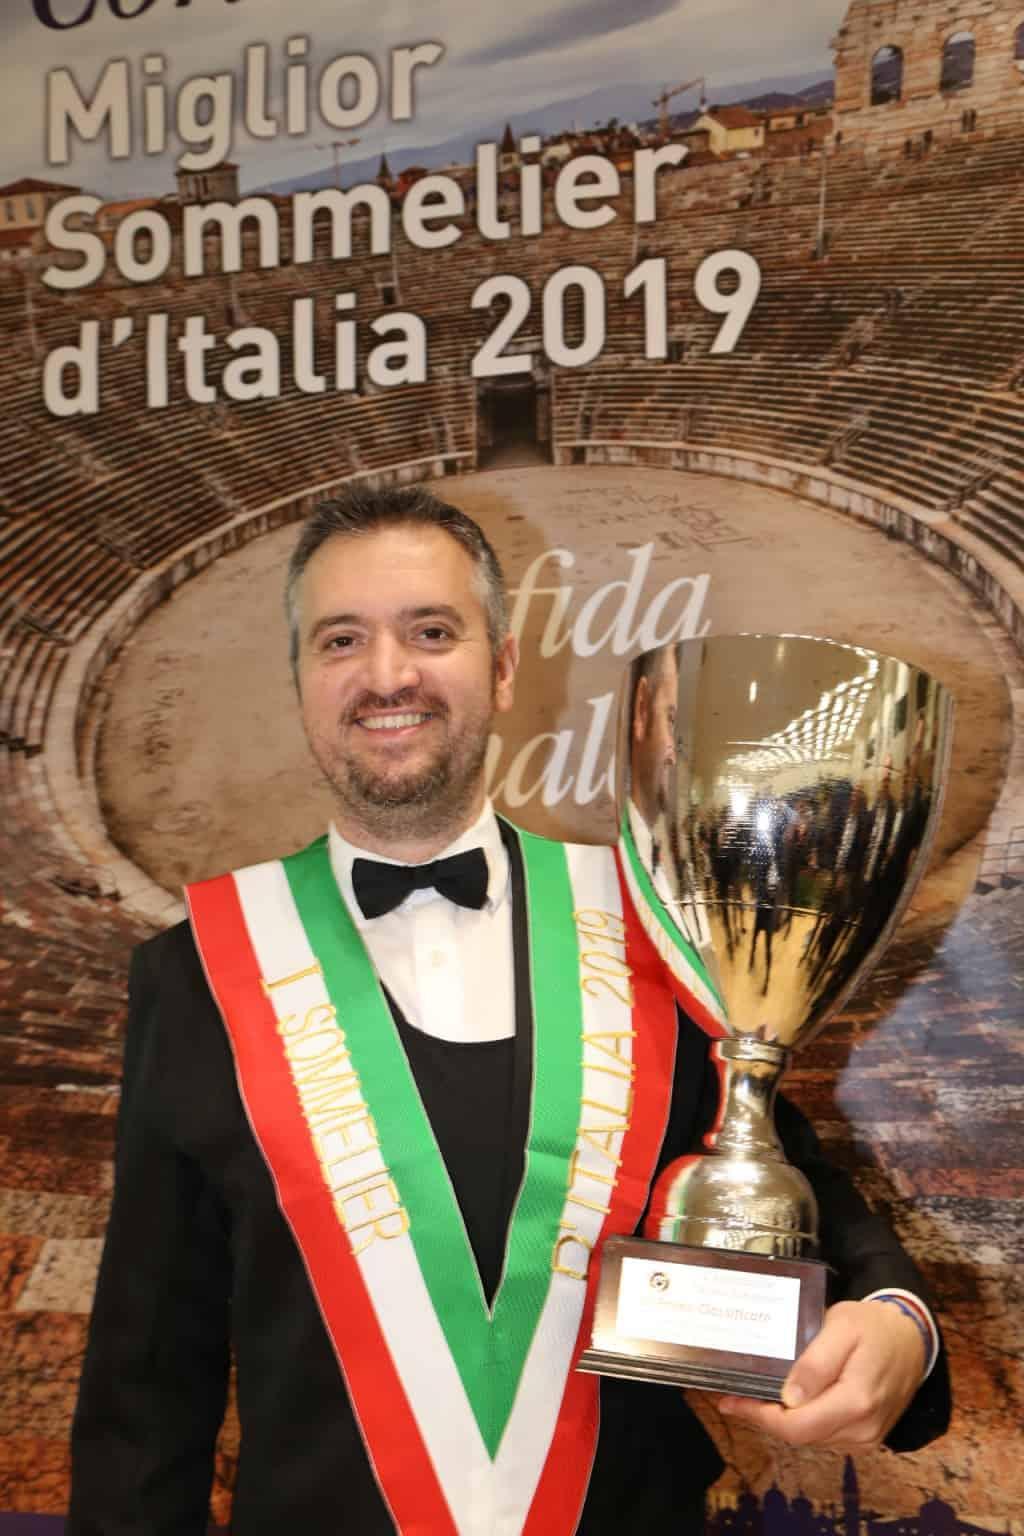 Miglior sommelier d'Italia - Premio Trentodoc